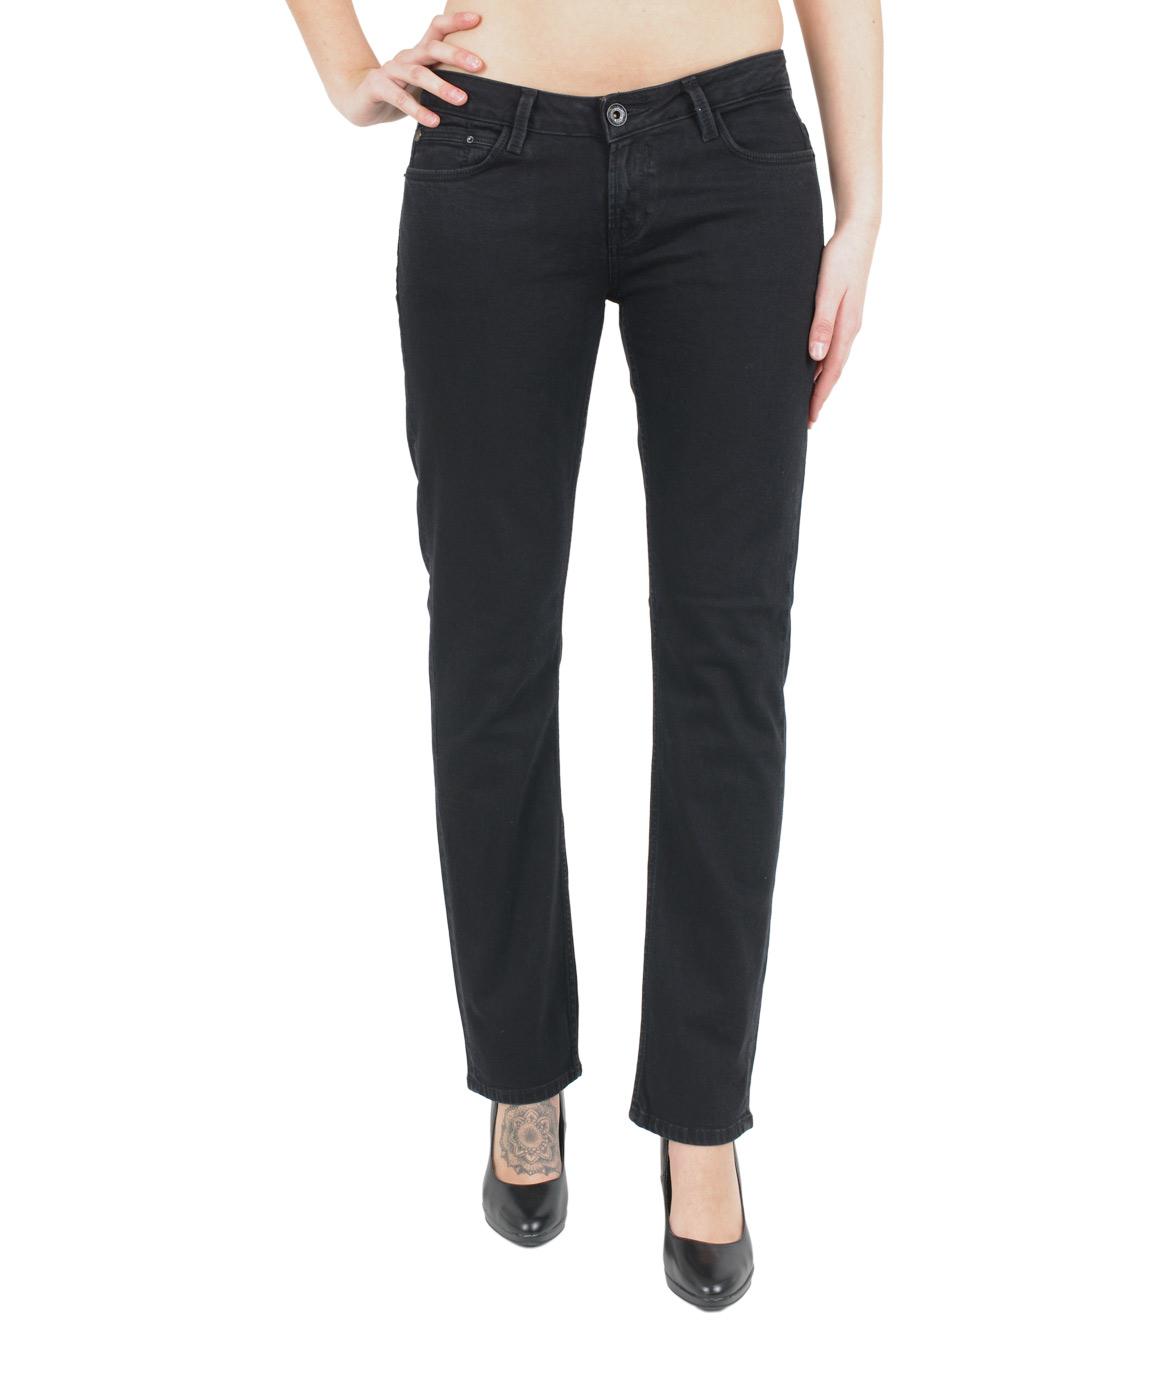 Hosen - Garcia Straight Leg Jeans Riva in Black Stone  - Onlineshop Jeans Meile